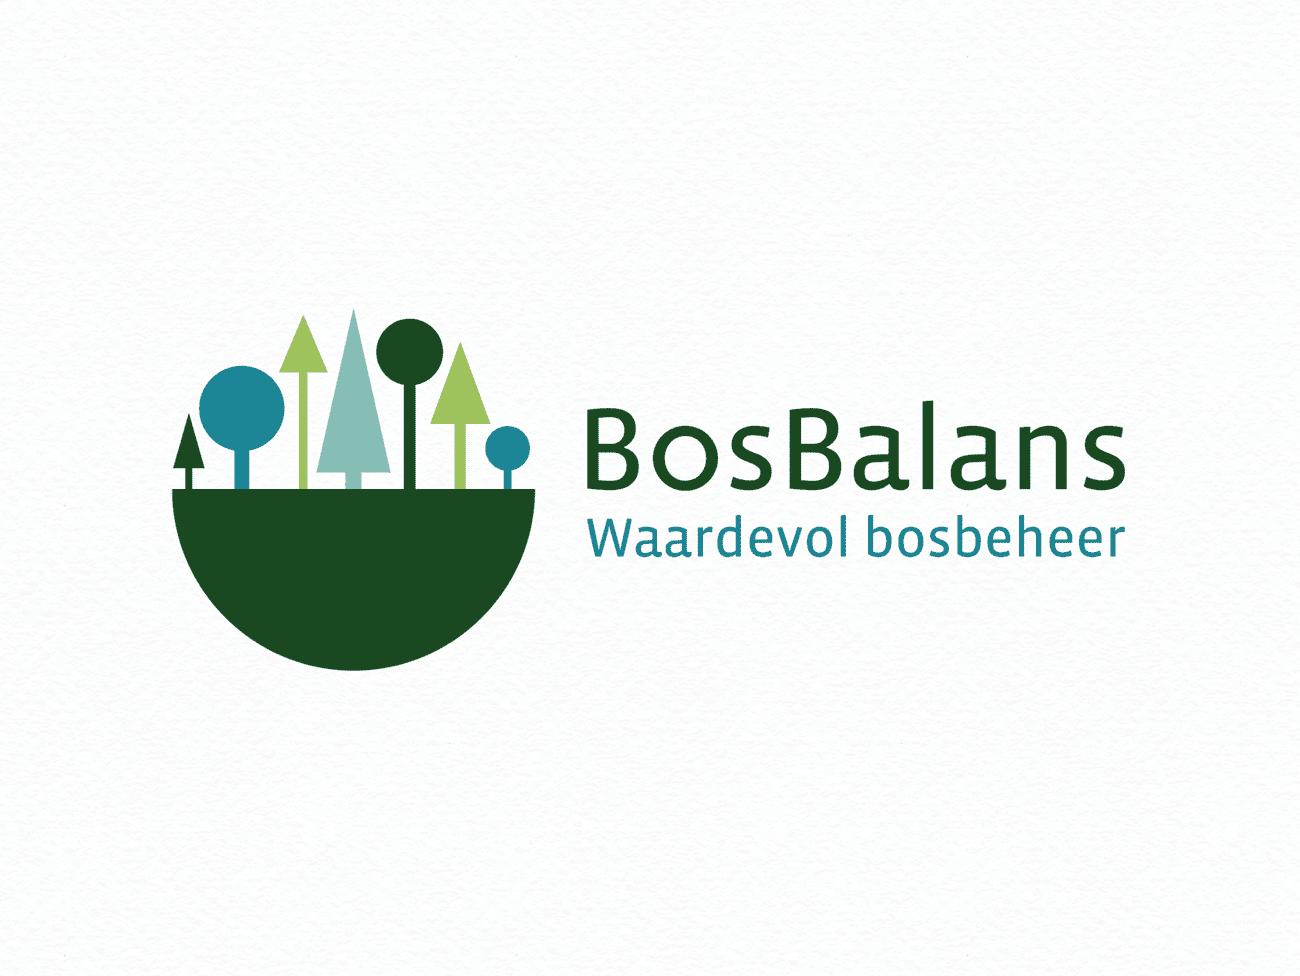 Bosbalans, identiteit, huisstijl, logo, visitekaartje, balans, bossen, groen, blauw, t-shirt, logo